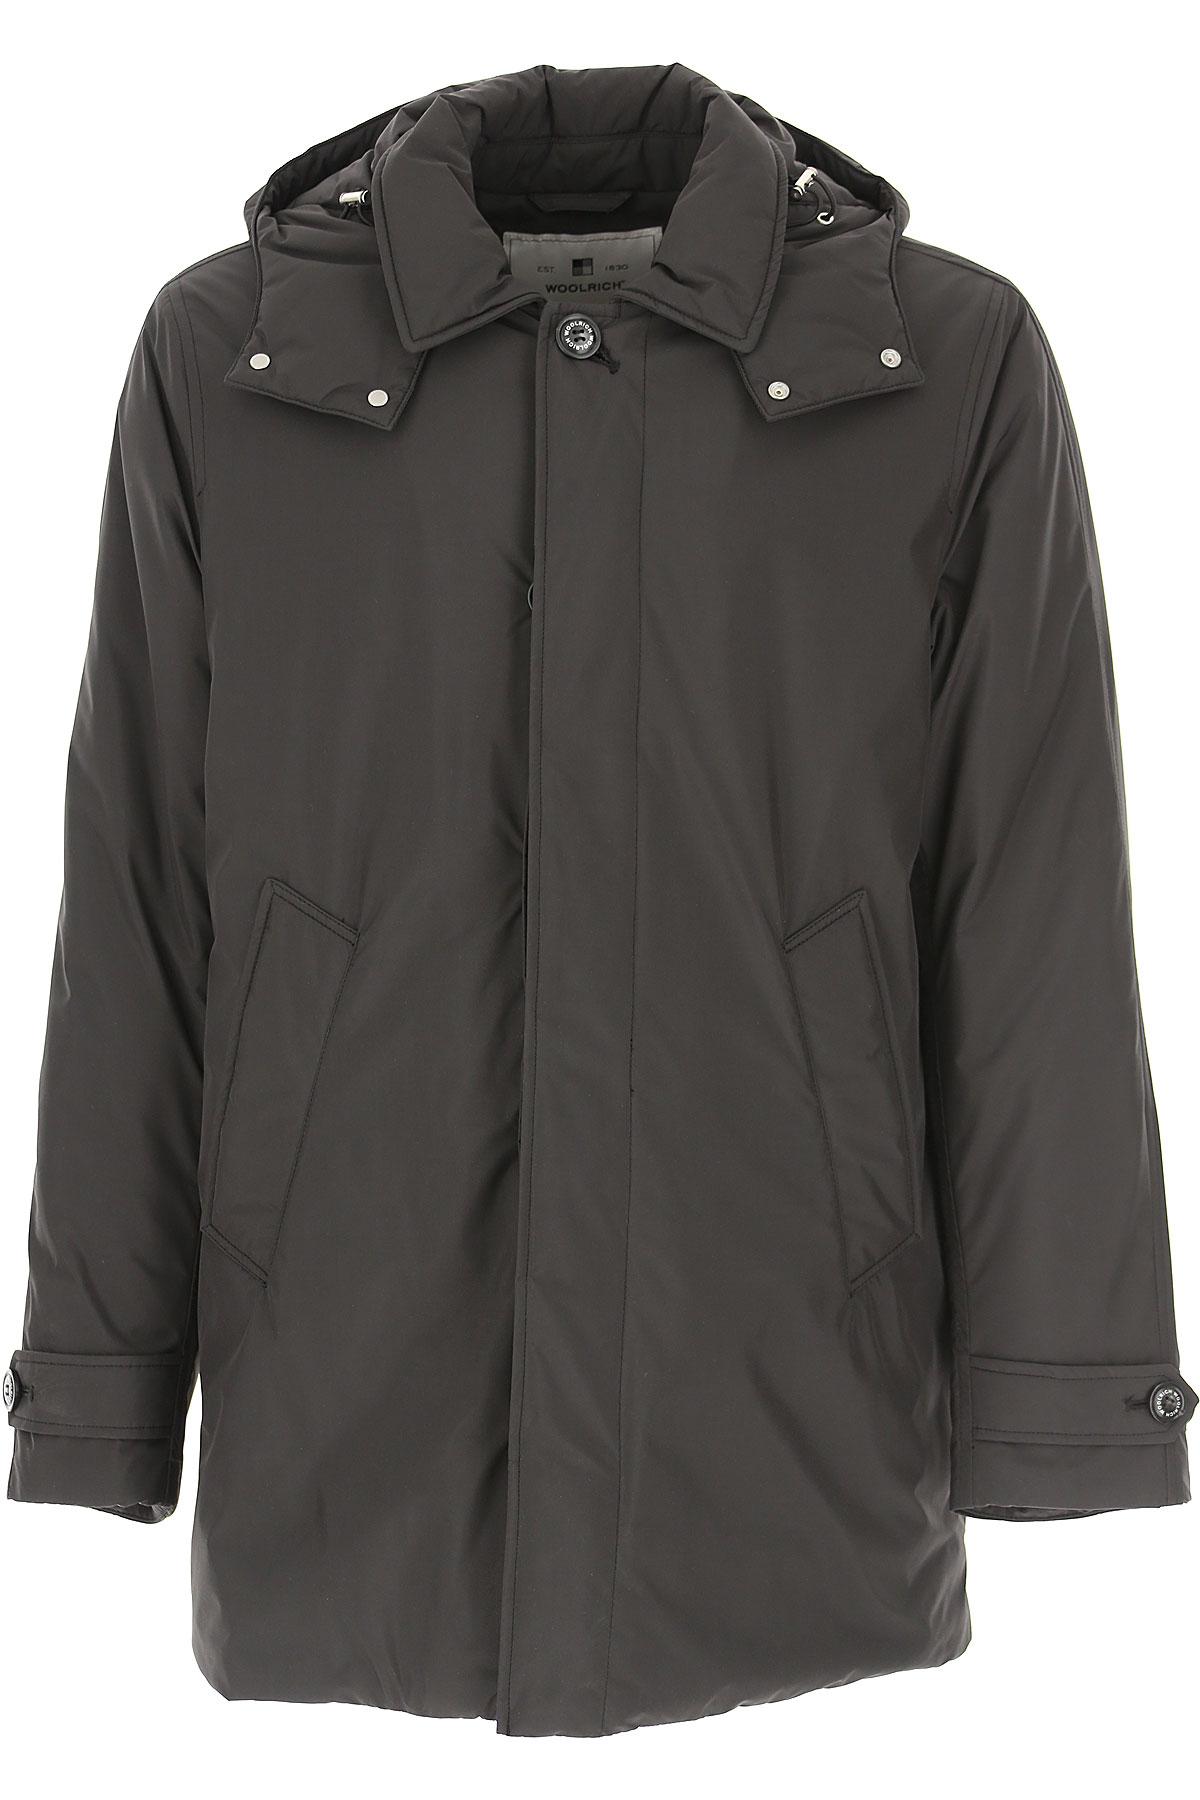 Woolrich Down Jacket for Men, Puffer Ski Jacket On Sale, Navy Blue, Down, 2019, L M XL